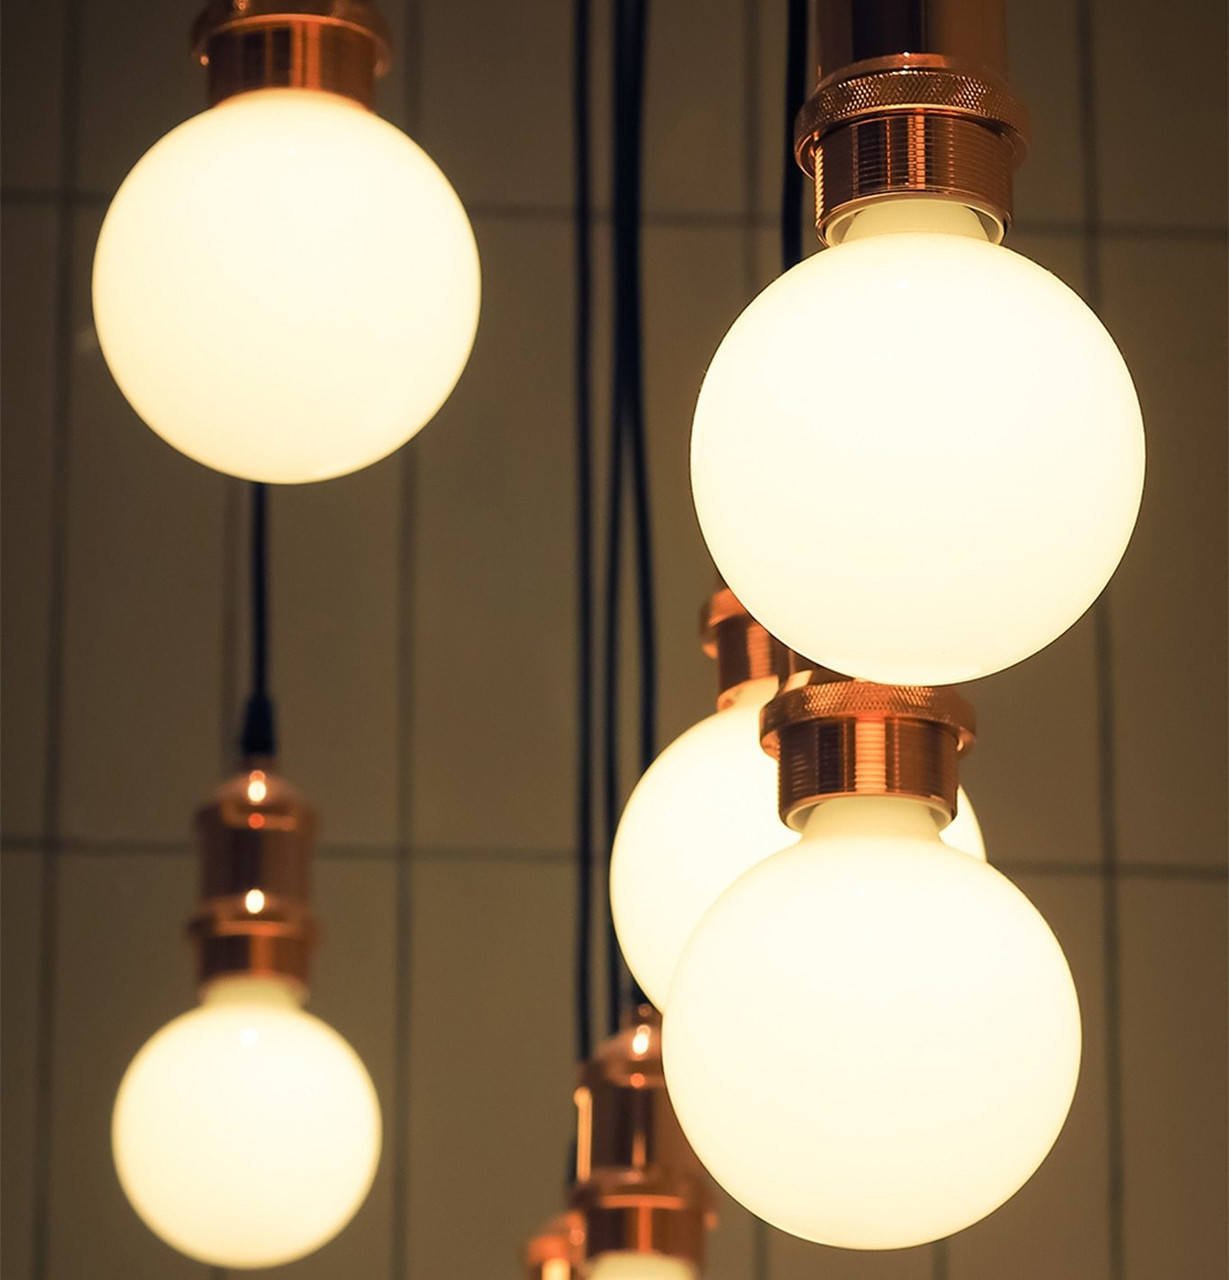 LED Dimmable Globe Pearl Light Bulbs